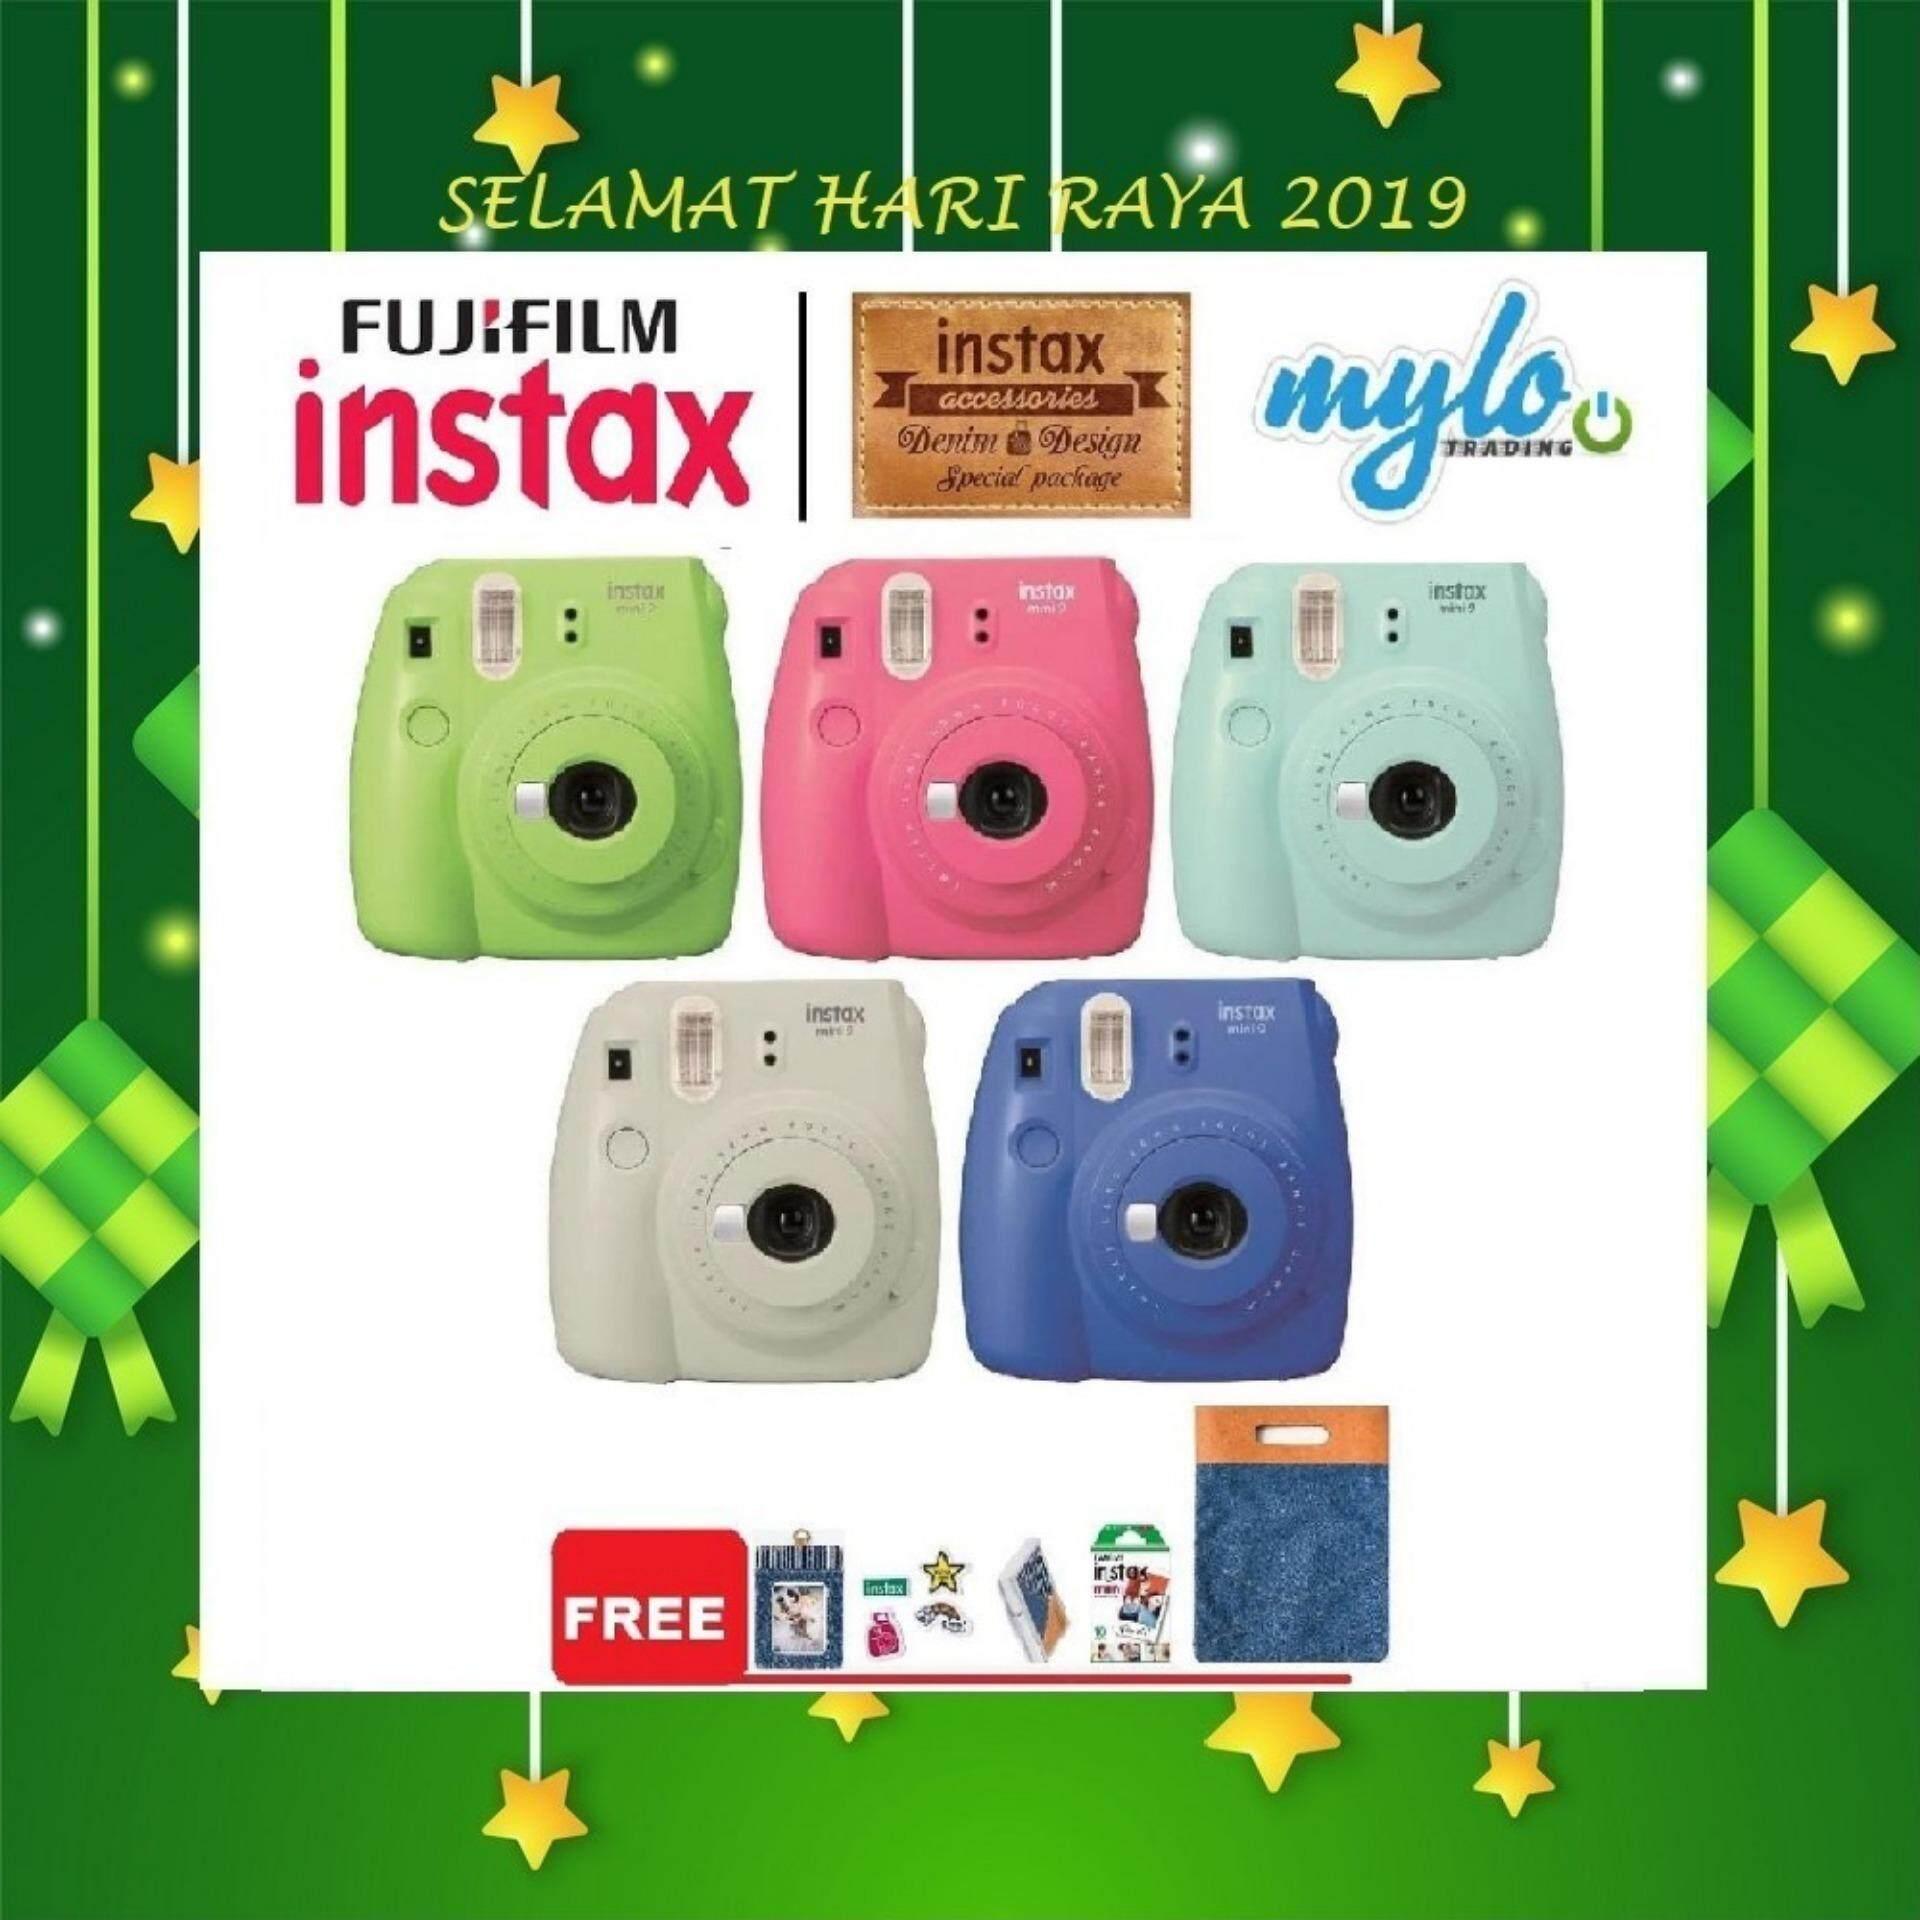 Fujifilm Instax Mini 9 Denim Package (buy 1 Free 5 Bundle) By Mylo Trading Online Store.